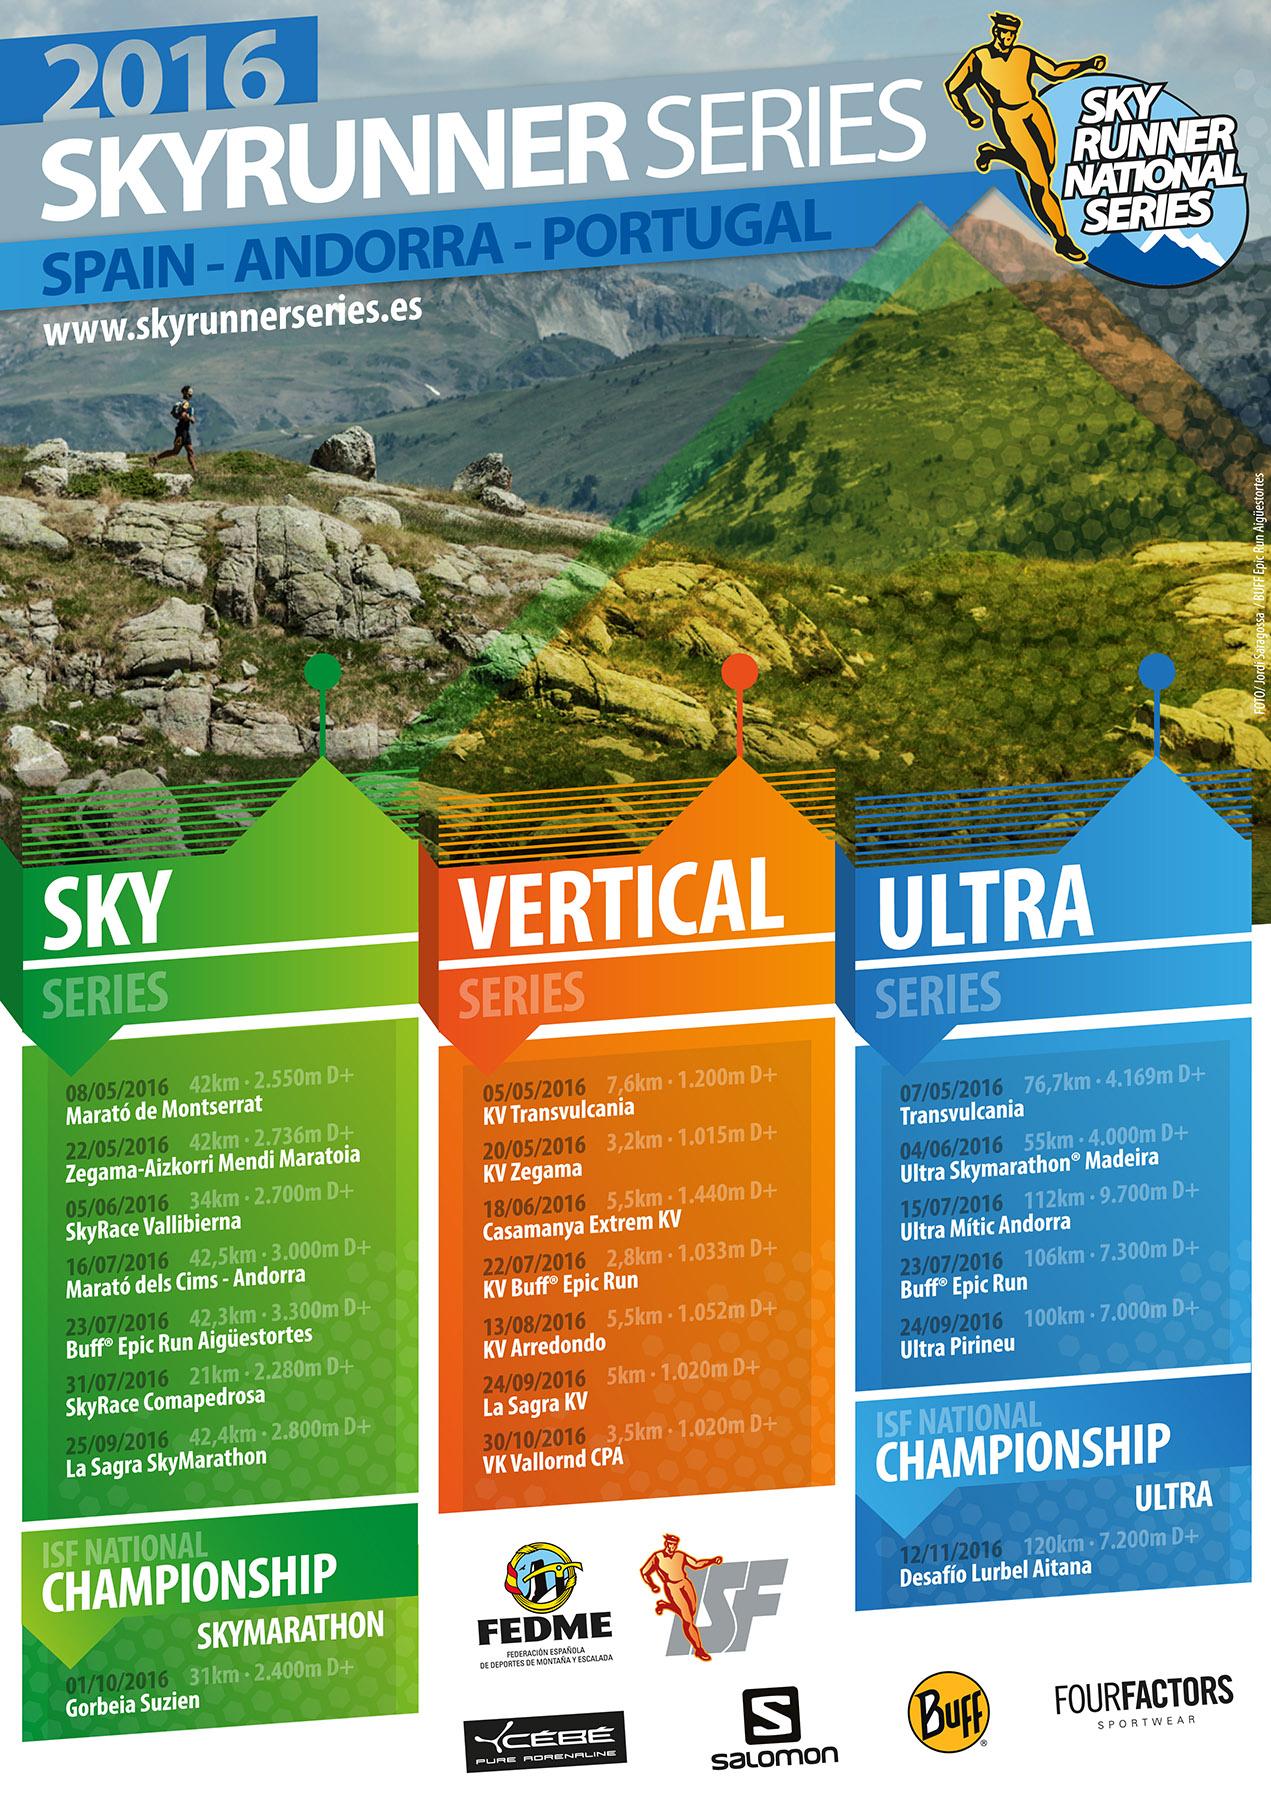 Calendario 2016 de las Skyrunner National Series Spain, Andorra & Portugal ISF